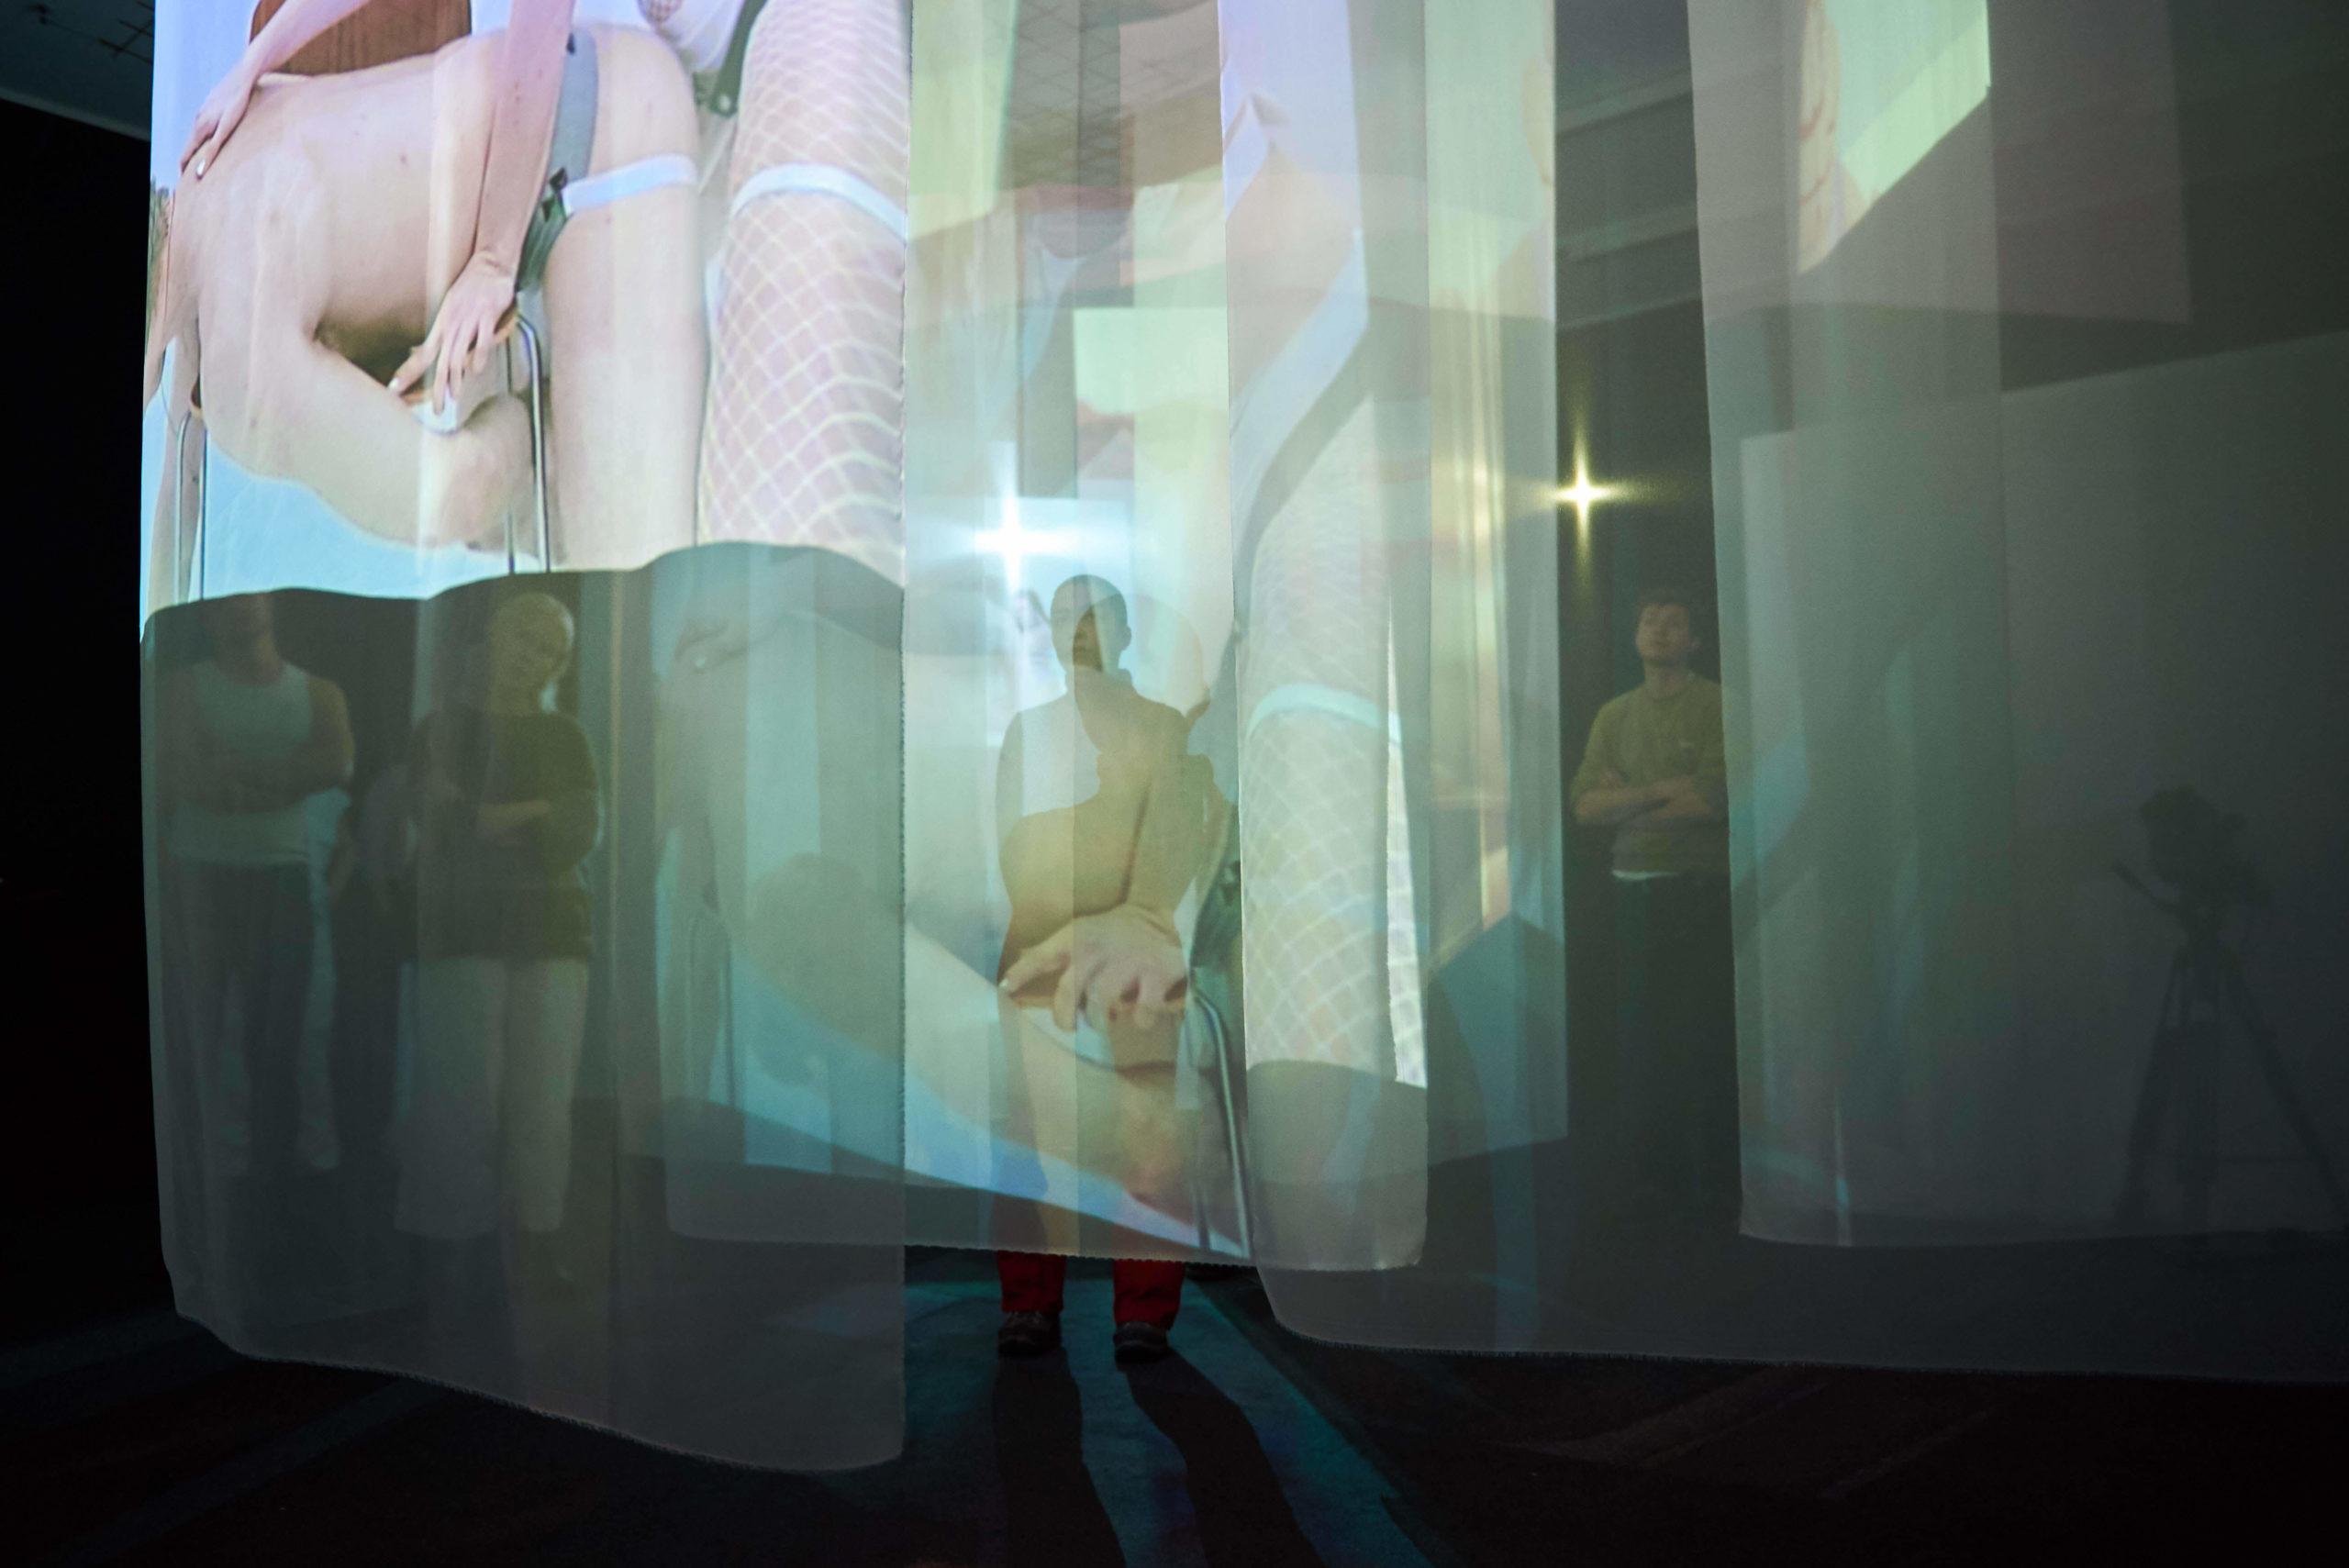 Kopi-af-PEEPshow_installation5_Copyrights_DetOvaleRum_Photographer_Sebastian-T.-Thorsted.jpg